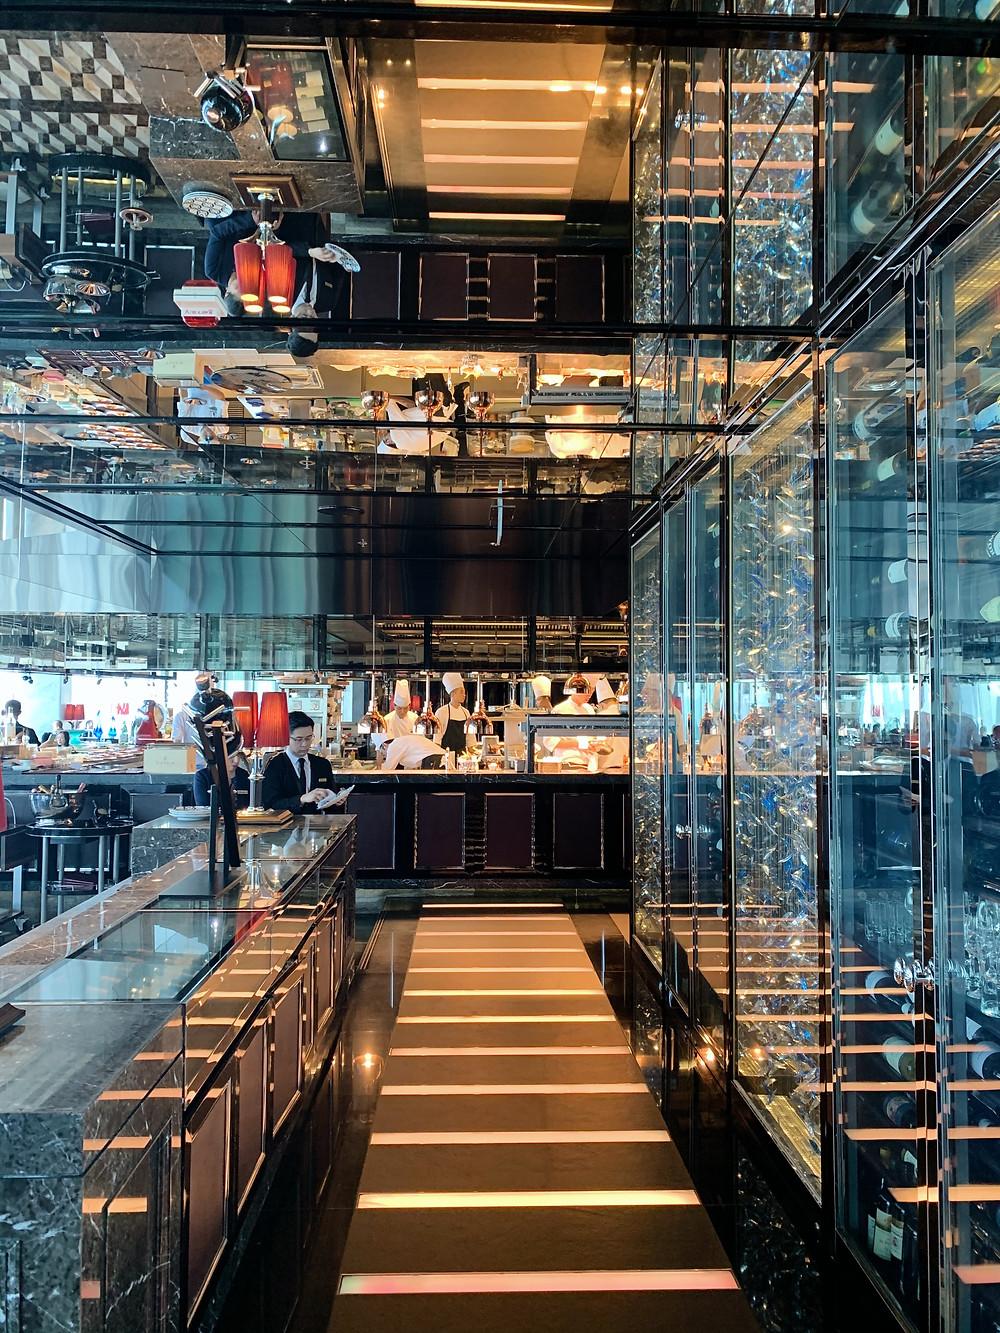 Tosca restaurant, Ritz-Carlton Hotel, Hong Kong